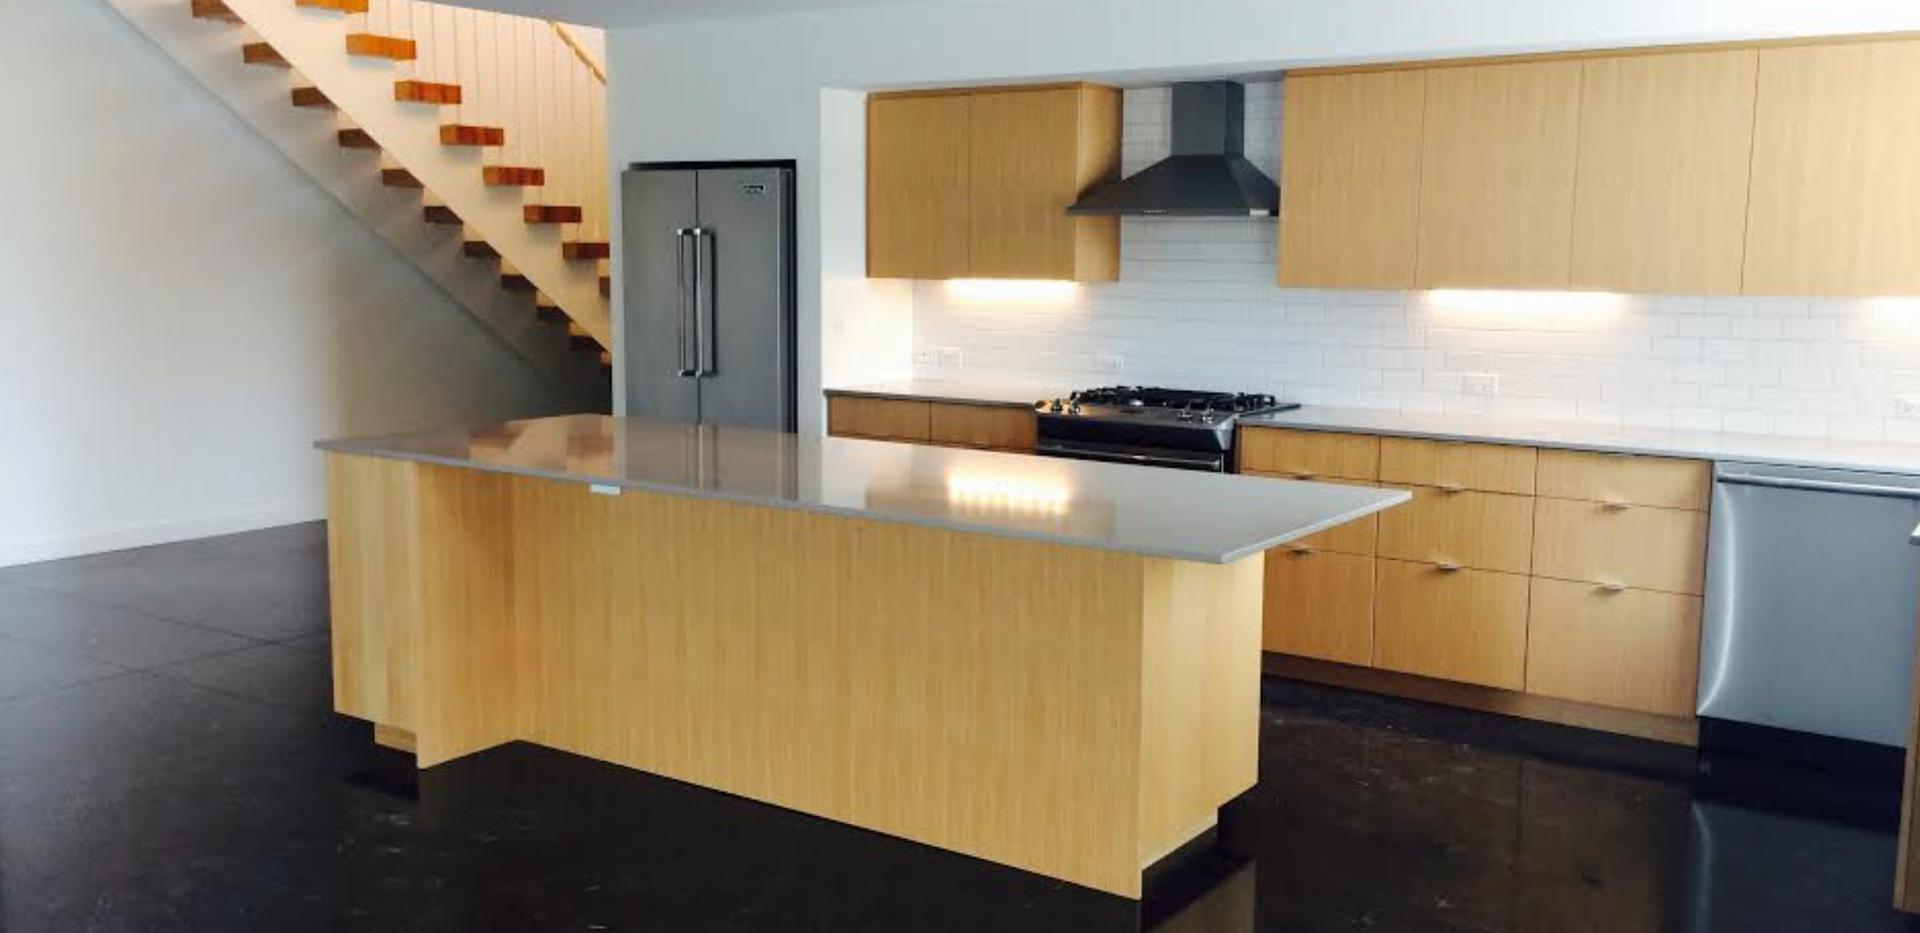 Studio 209 Kitchen 3.png